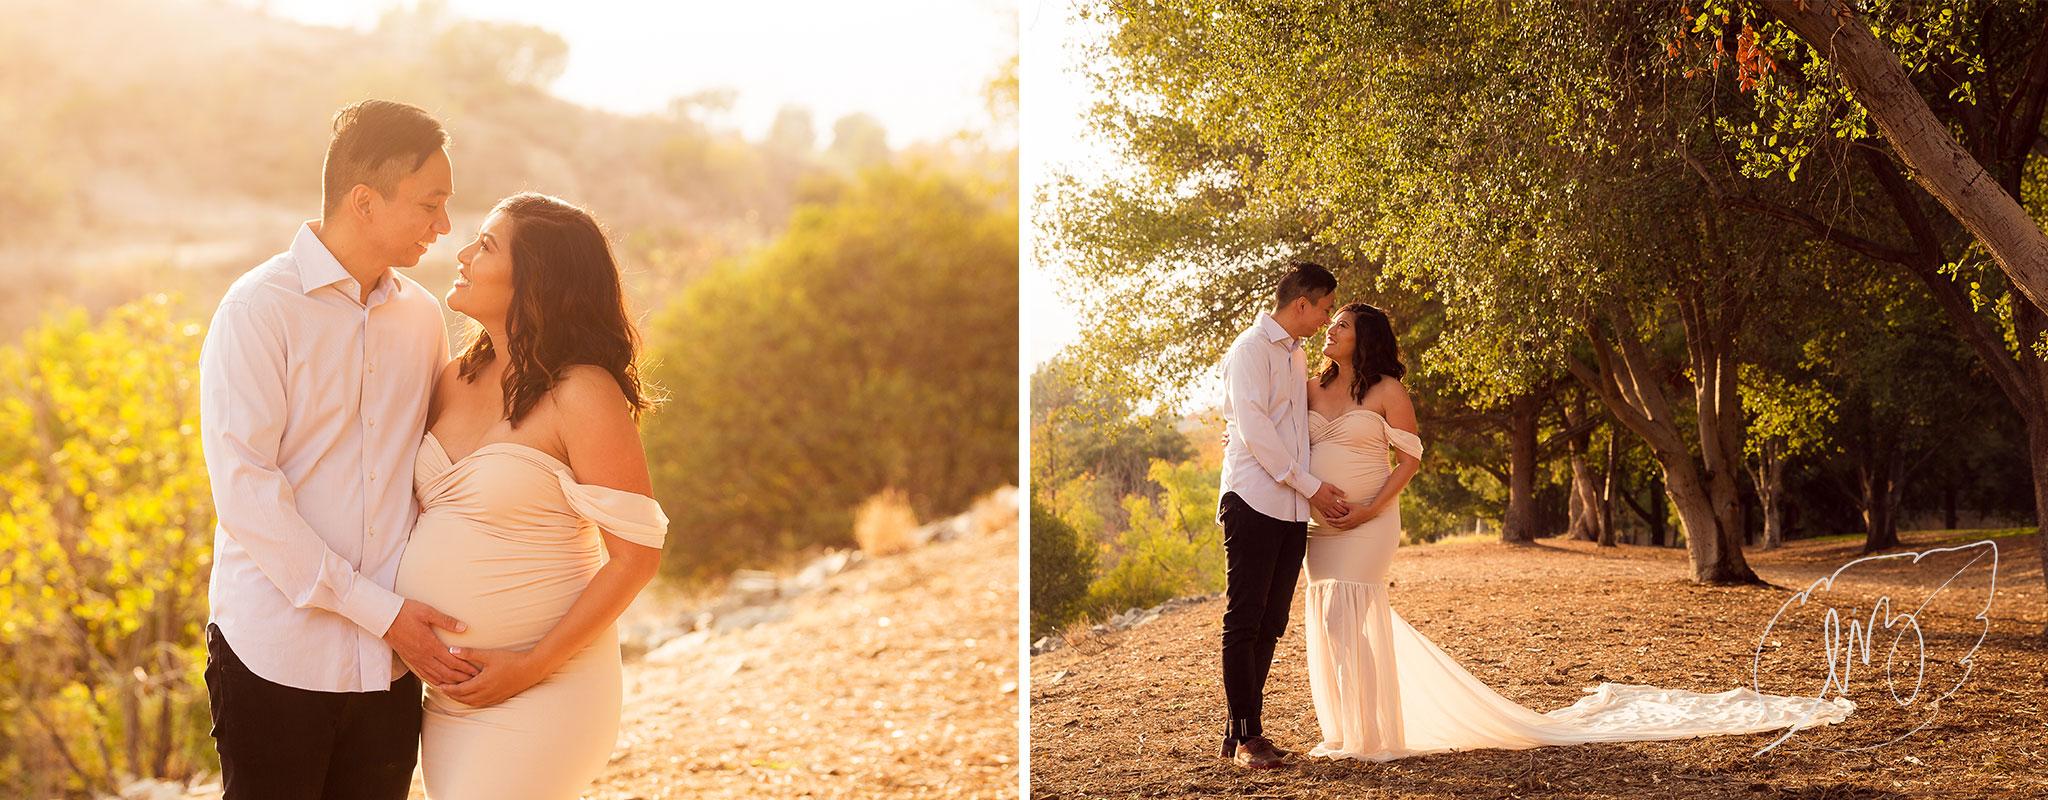 California_Inland_Empire_Maternity_Photographer_08.jpg